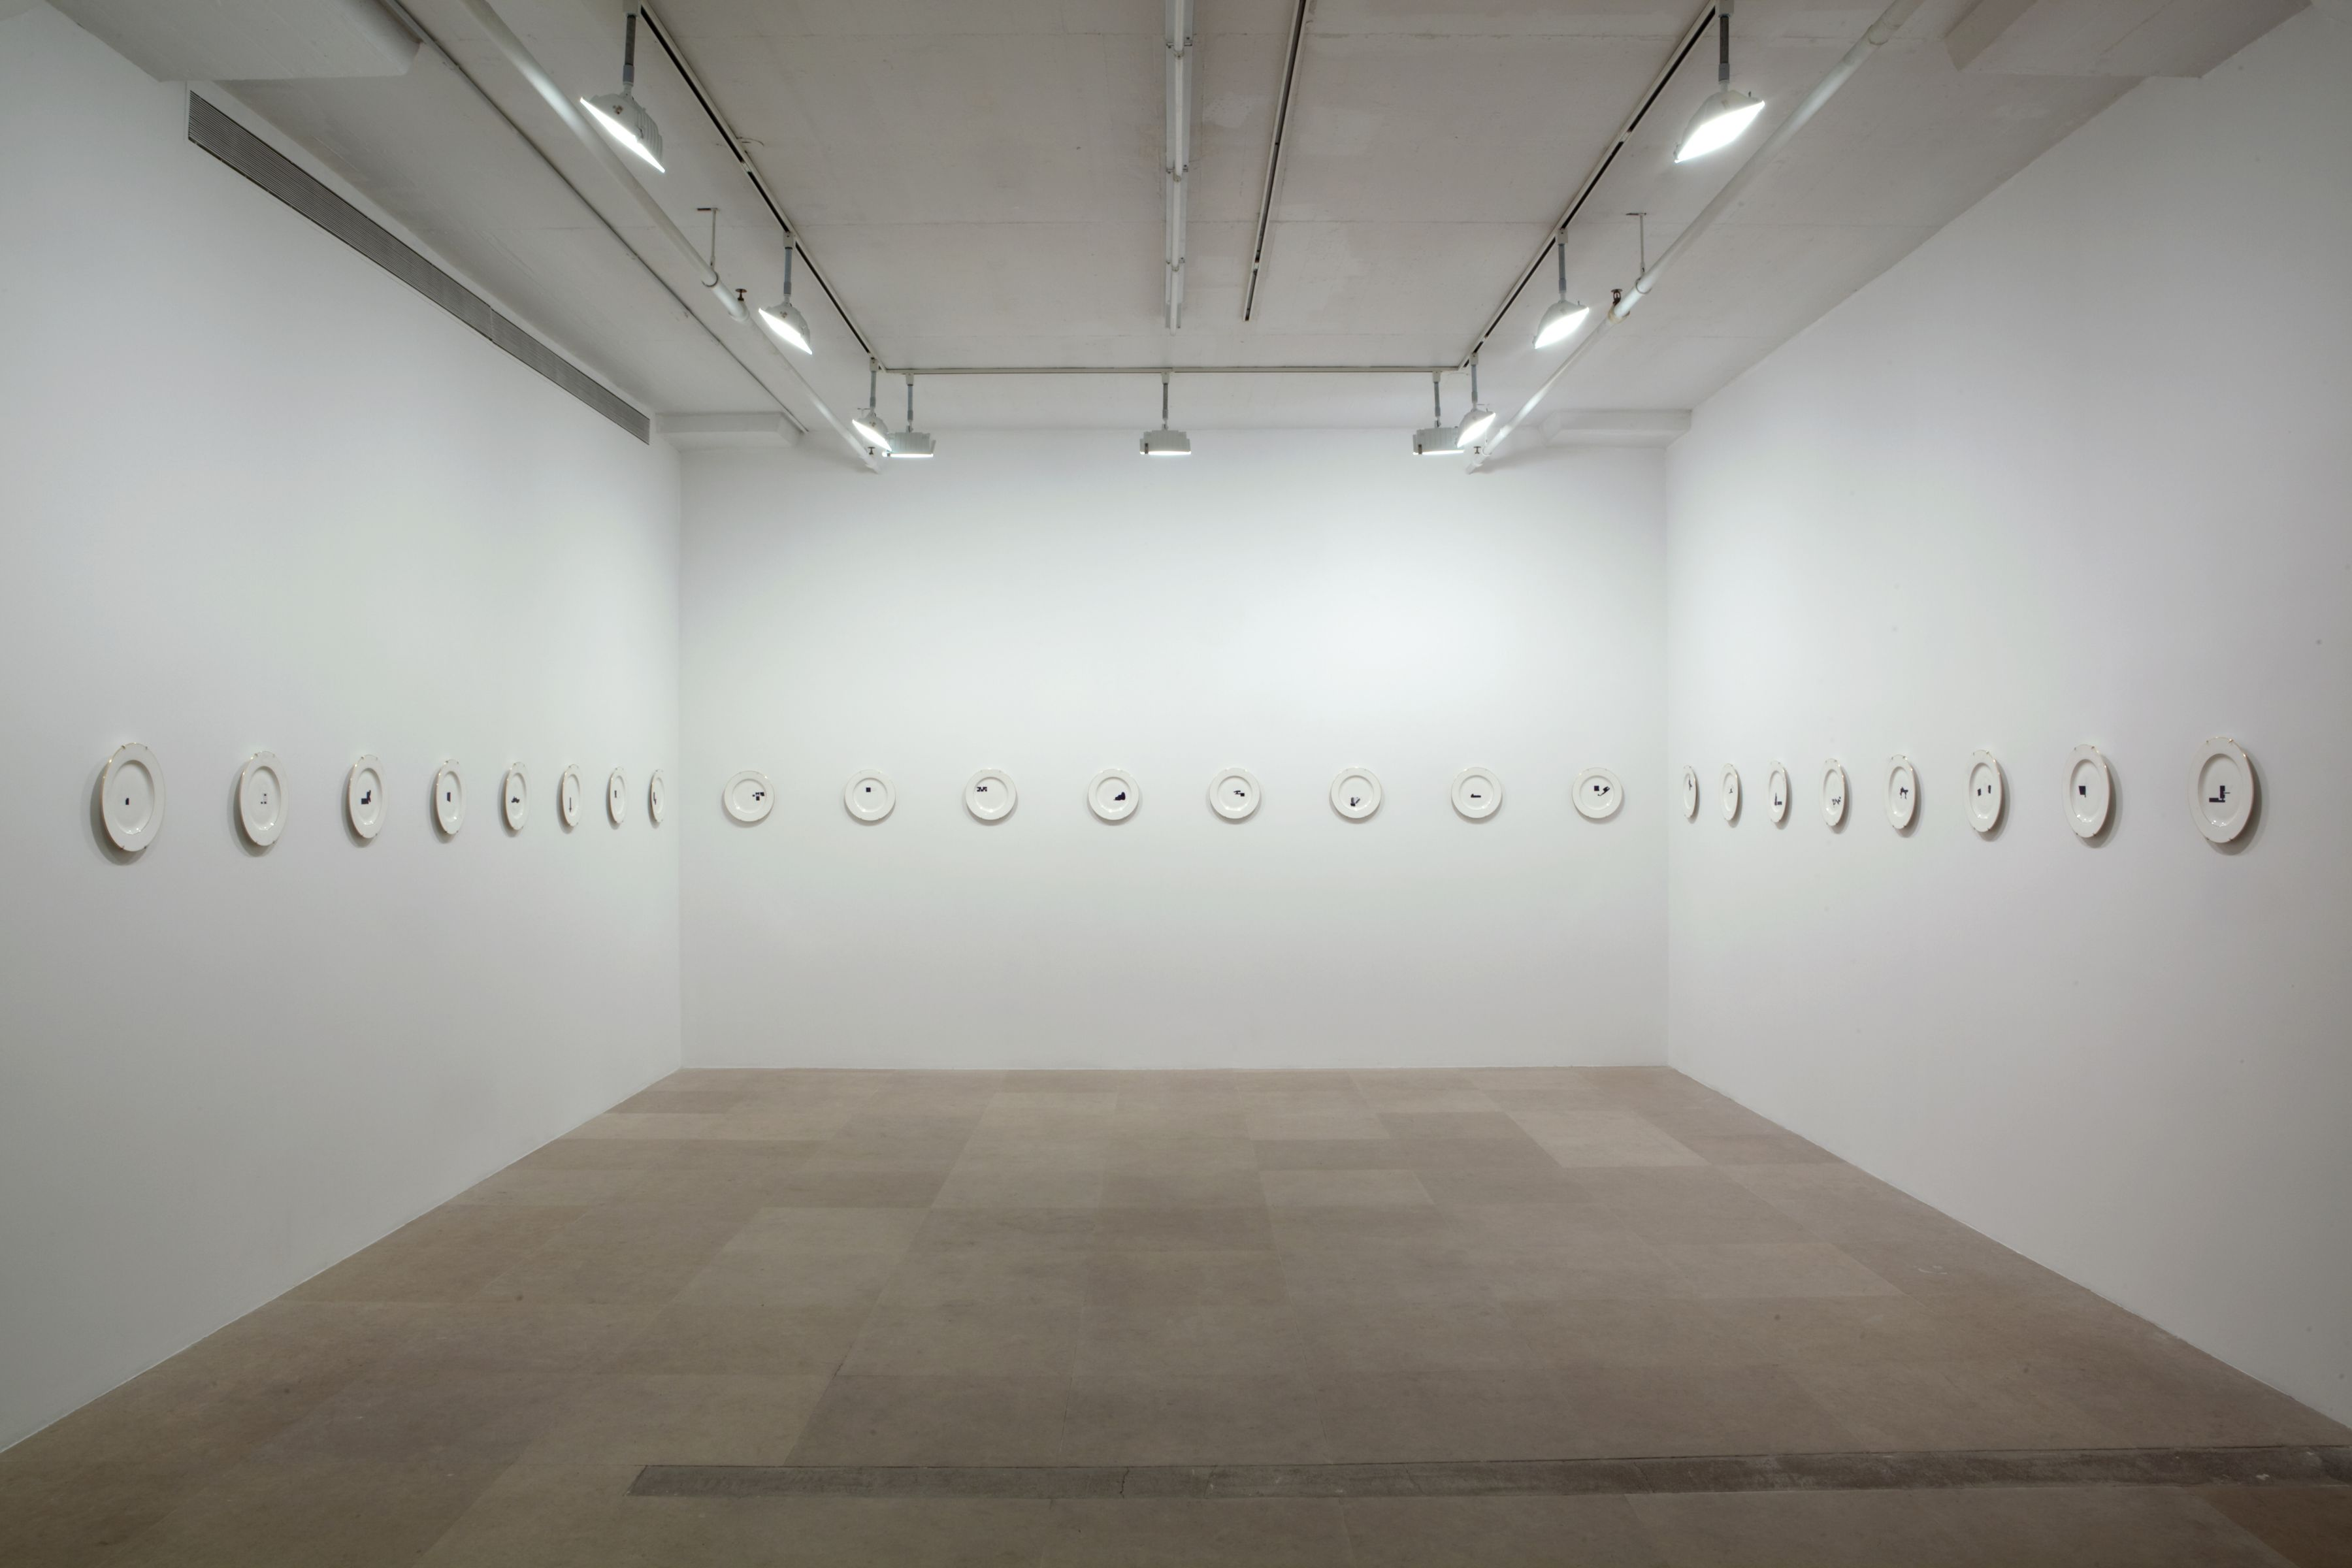 Installation view, A Work In Situ, Greene Naftali, New York, 2011